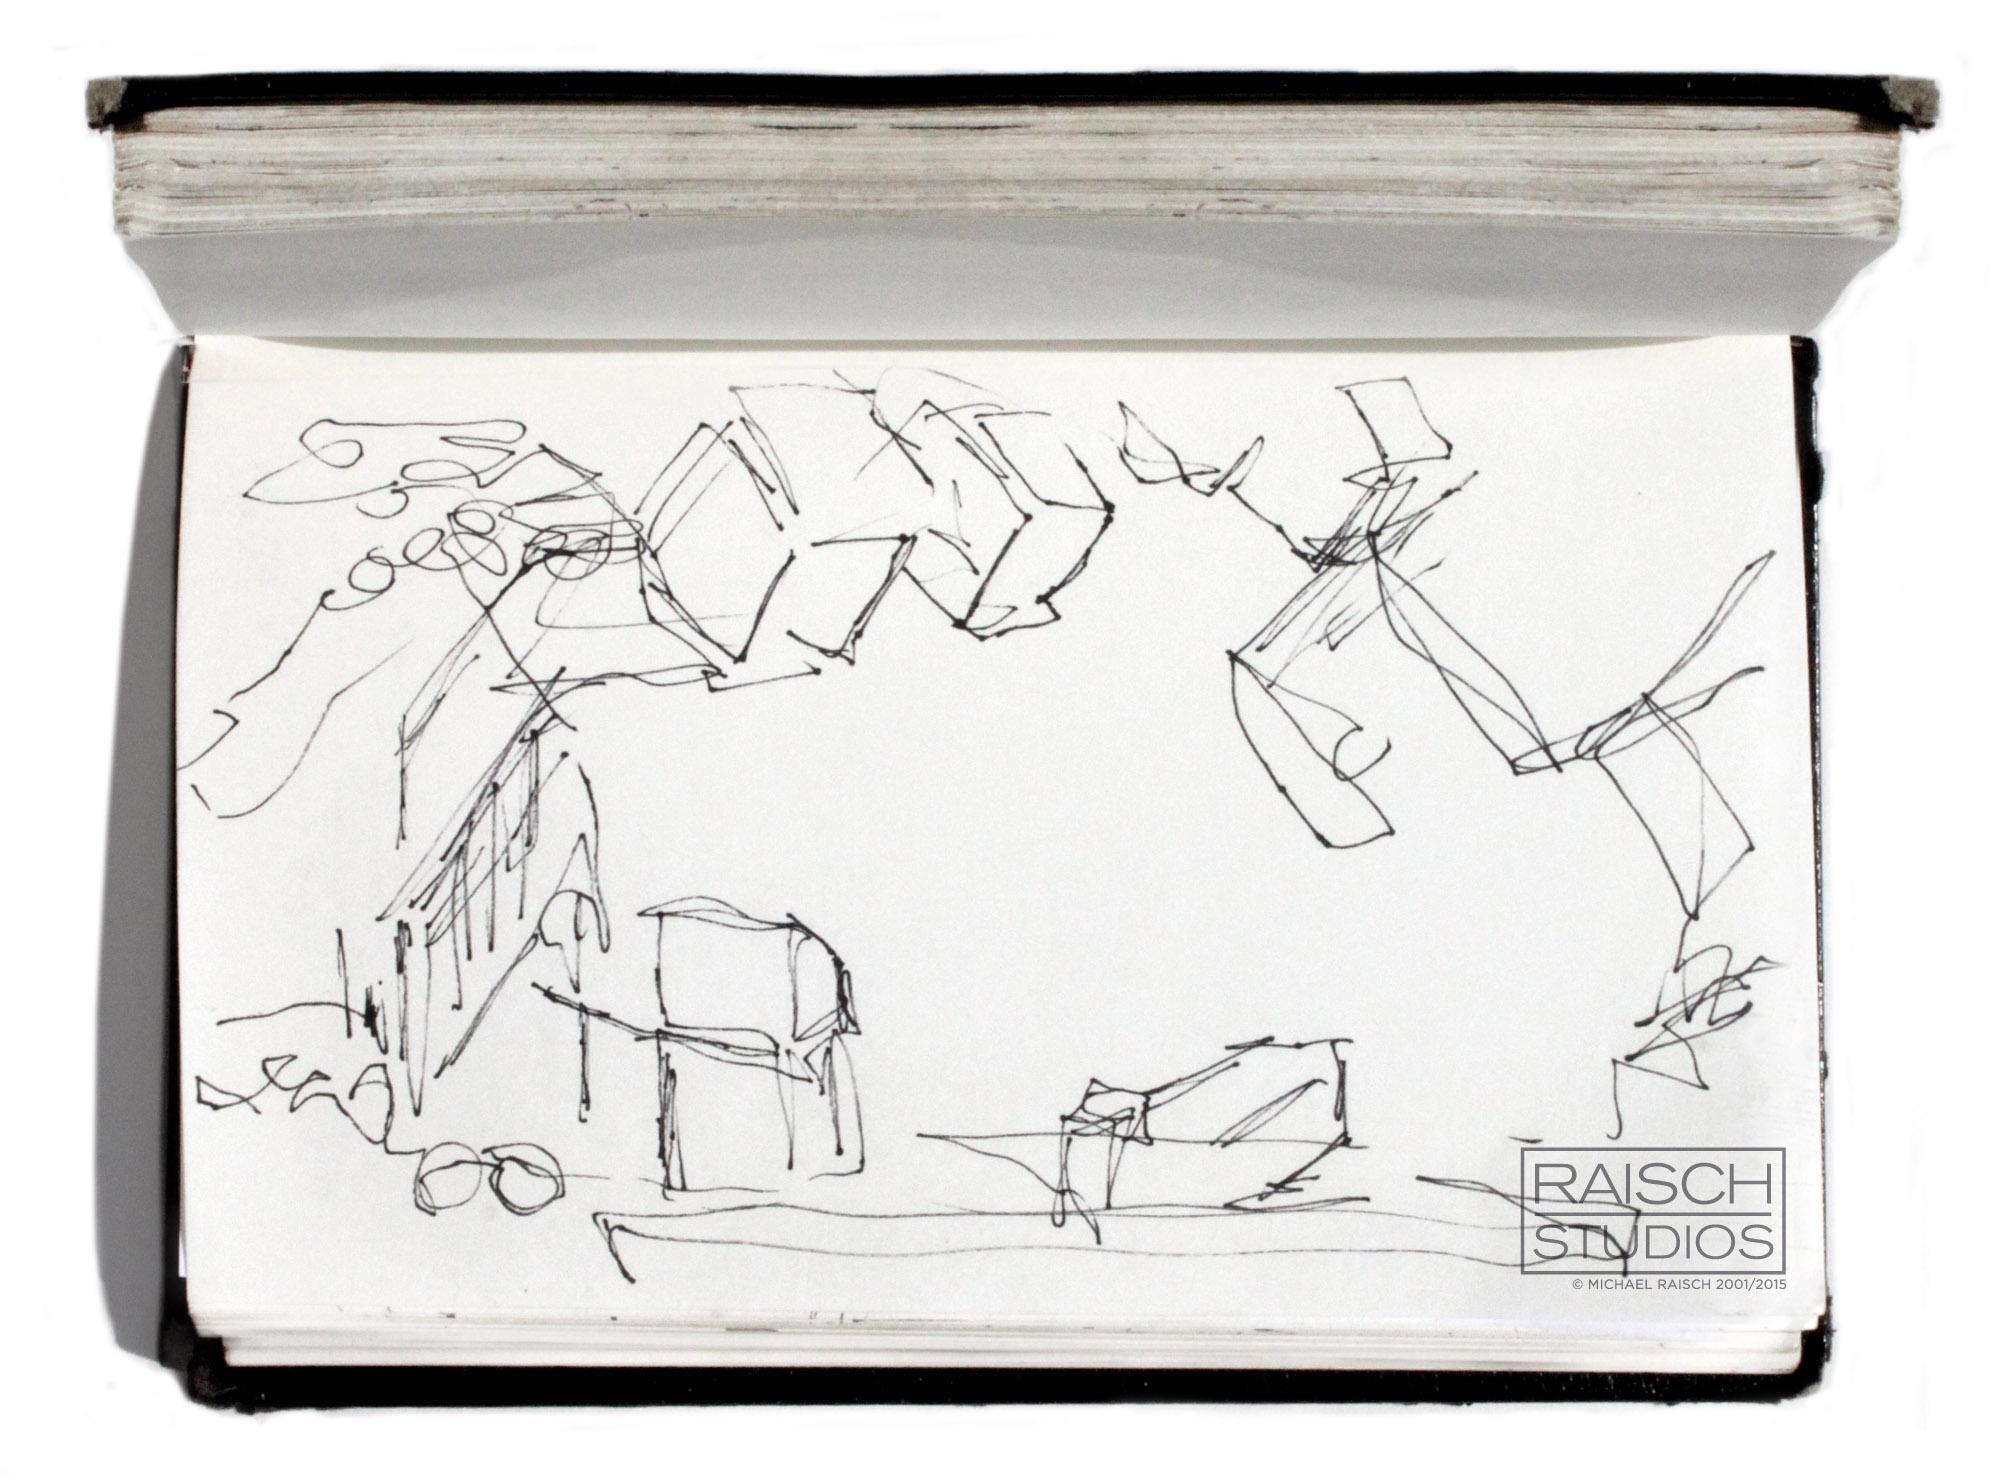 Original gesture sketch of the Saturday Night Live studios, November 3, 2001